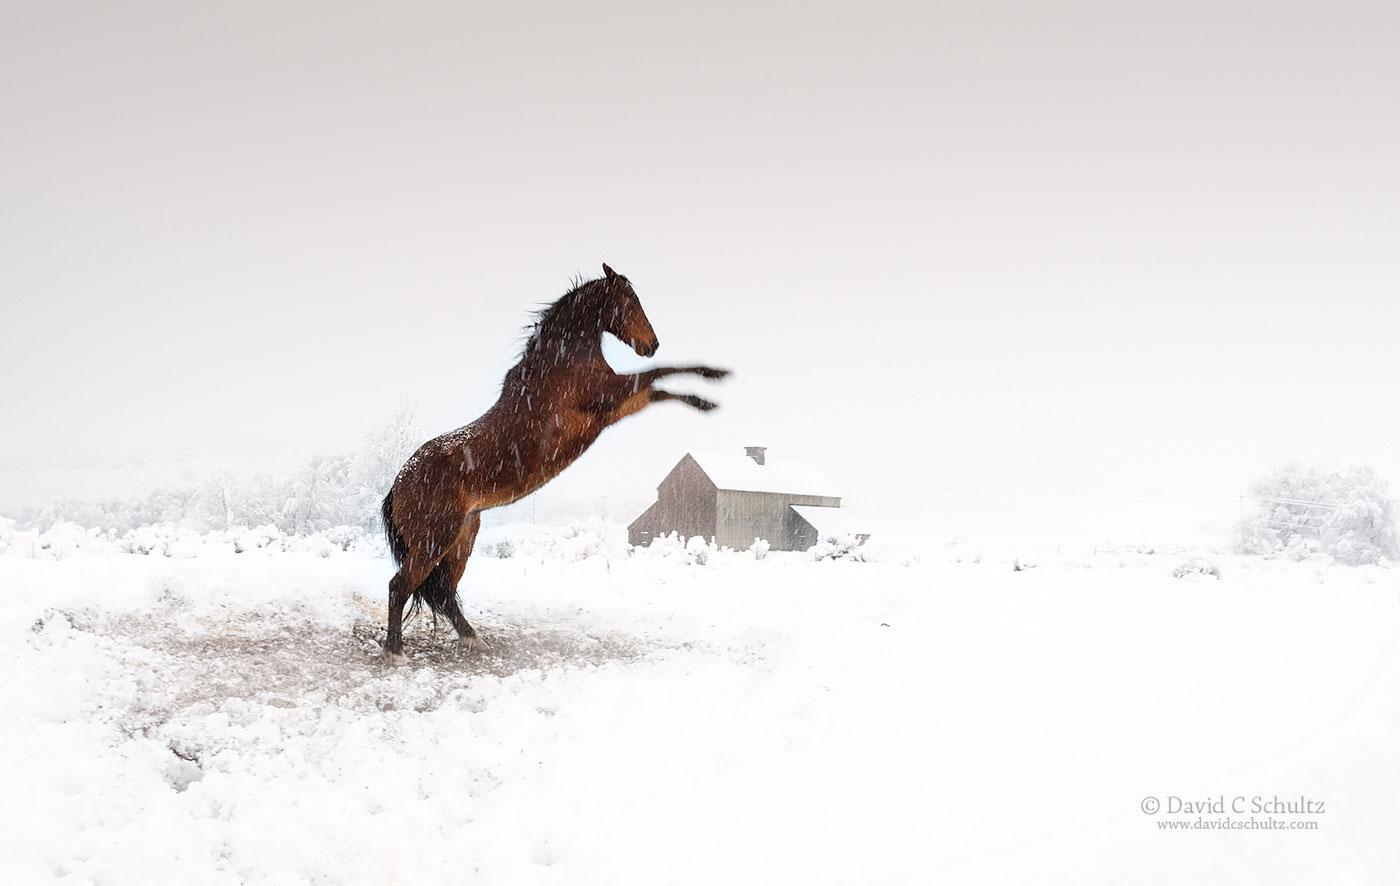 Horse and the Tate Barn Utah - Image #47-3154